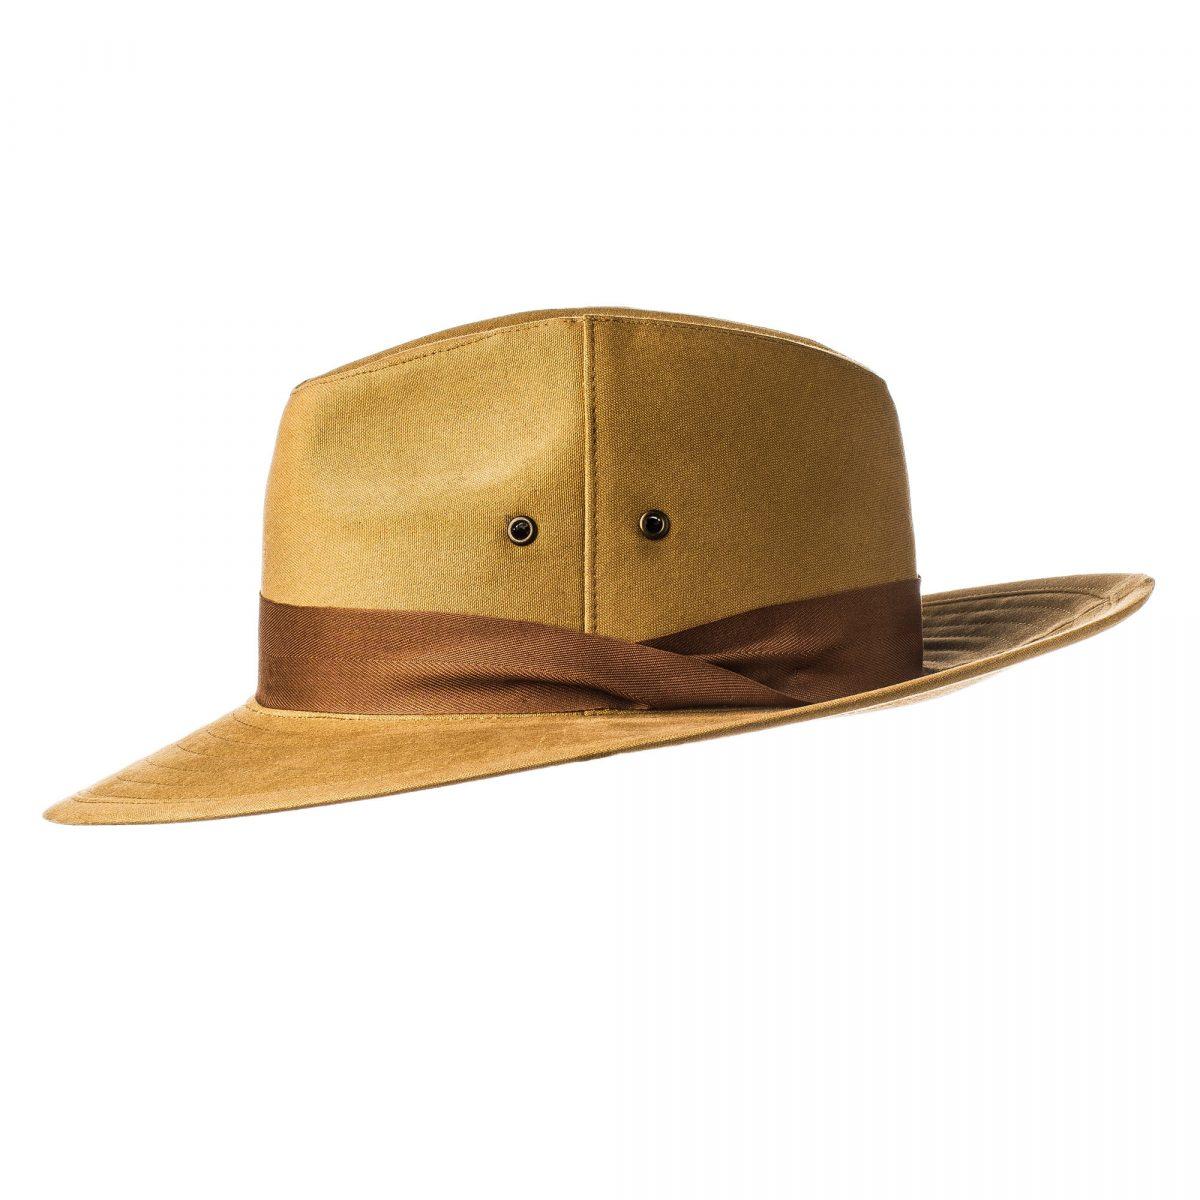 wr_co_safari_hat-2092-edit